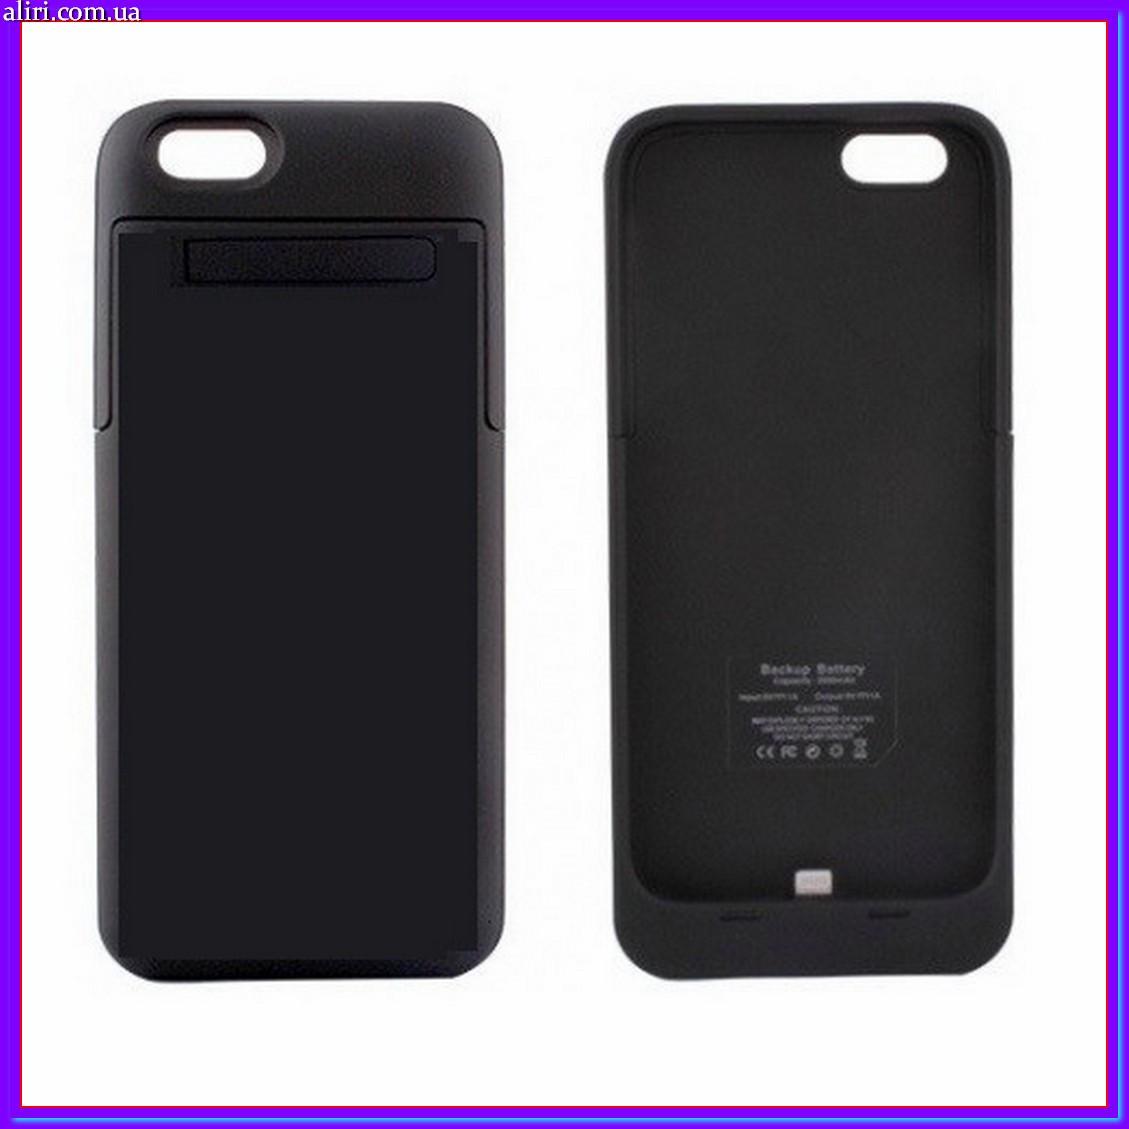 32606cd8cb307 Чехол-аккумулятор для Apple iPhone 5 2200 mAh черный - Интернет магазин